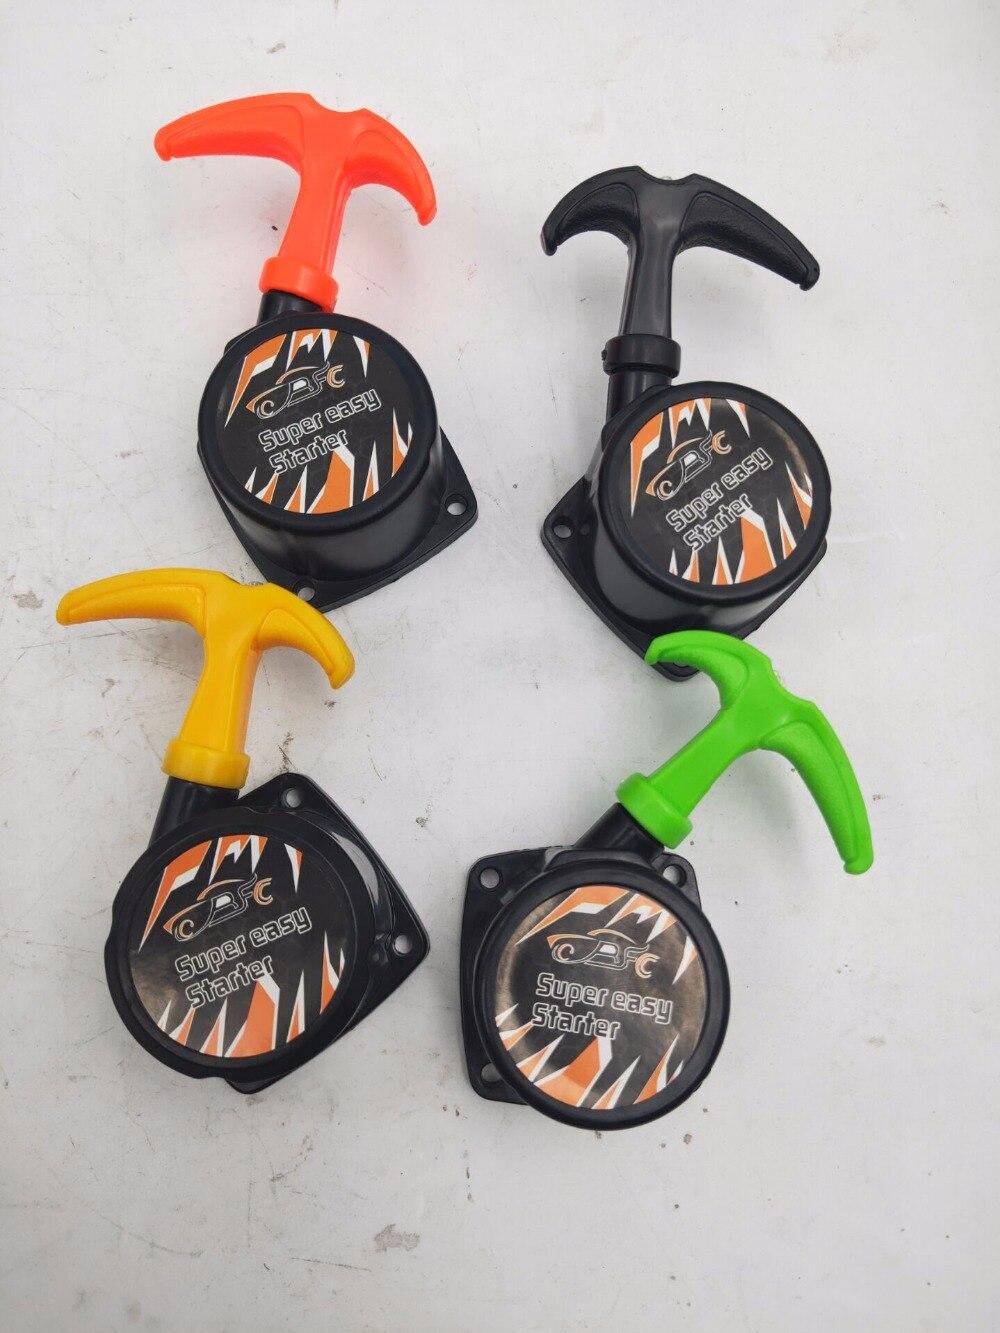 Alloy Pull Starter Handle Orange Fits Baja Buggy 1//5th RC Baja 001 5B 5T T1000